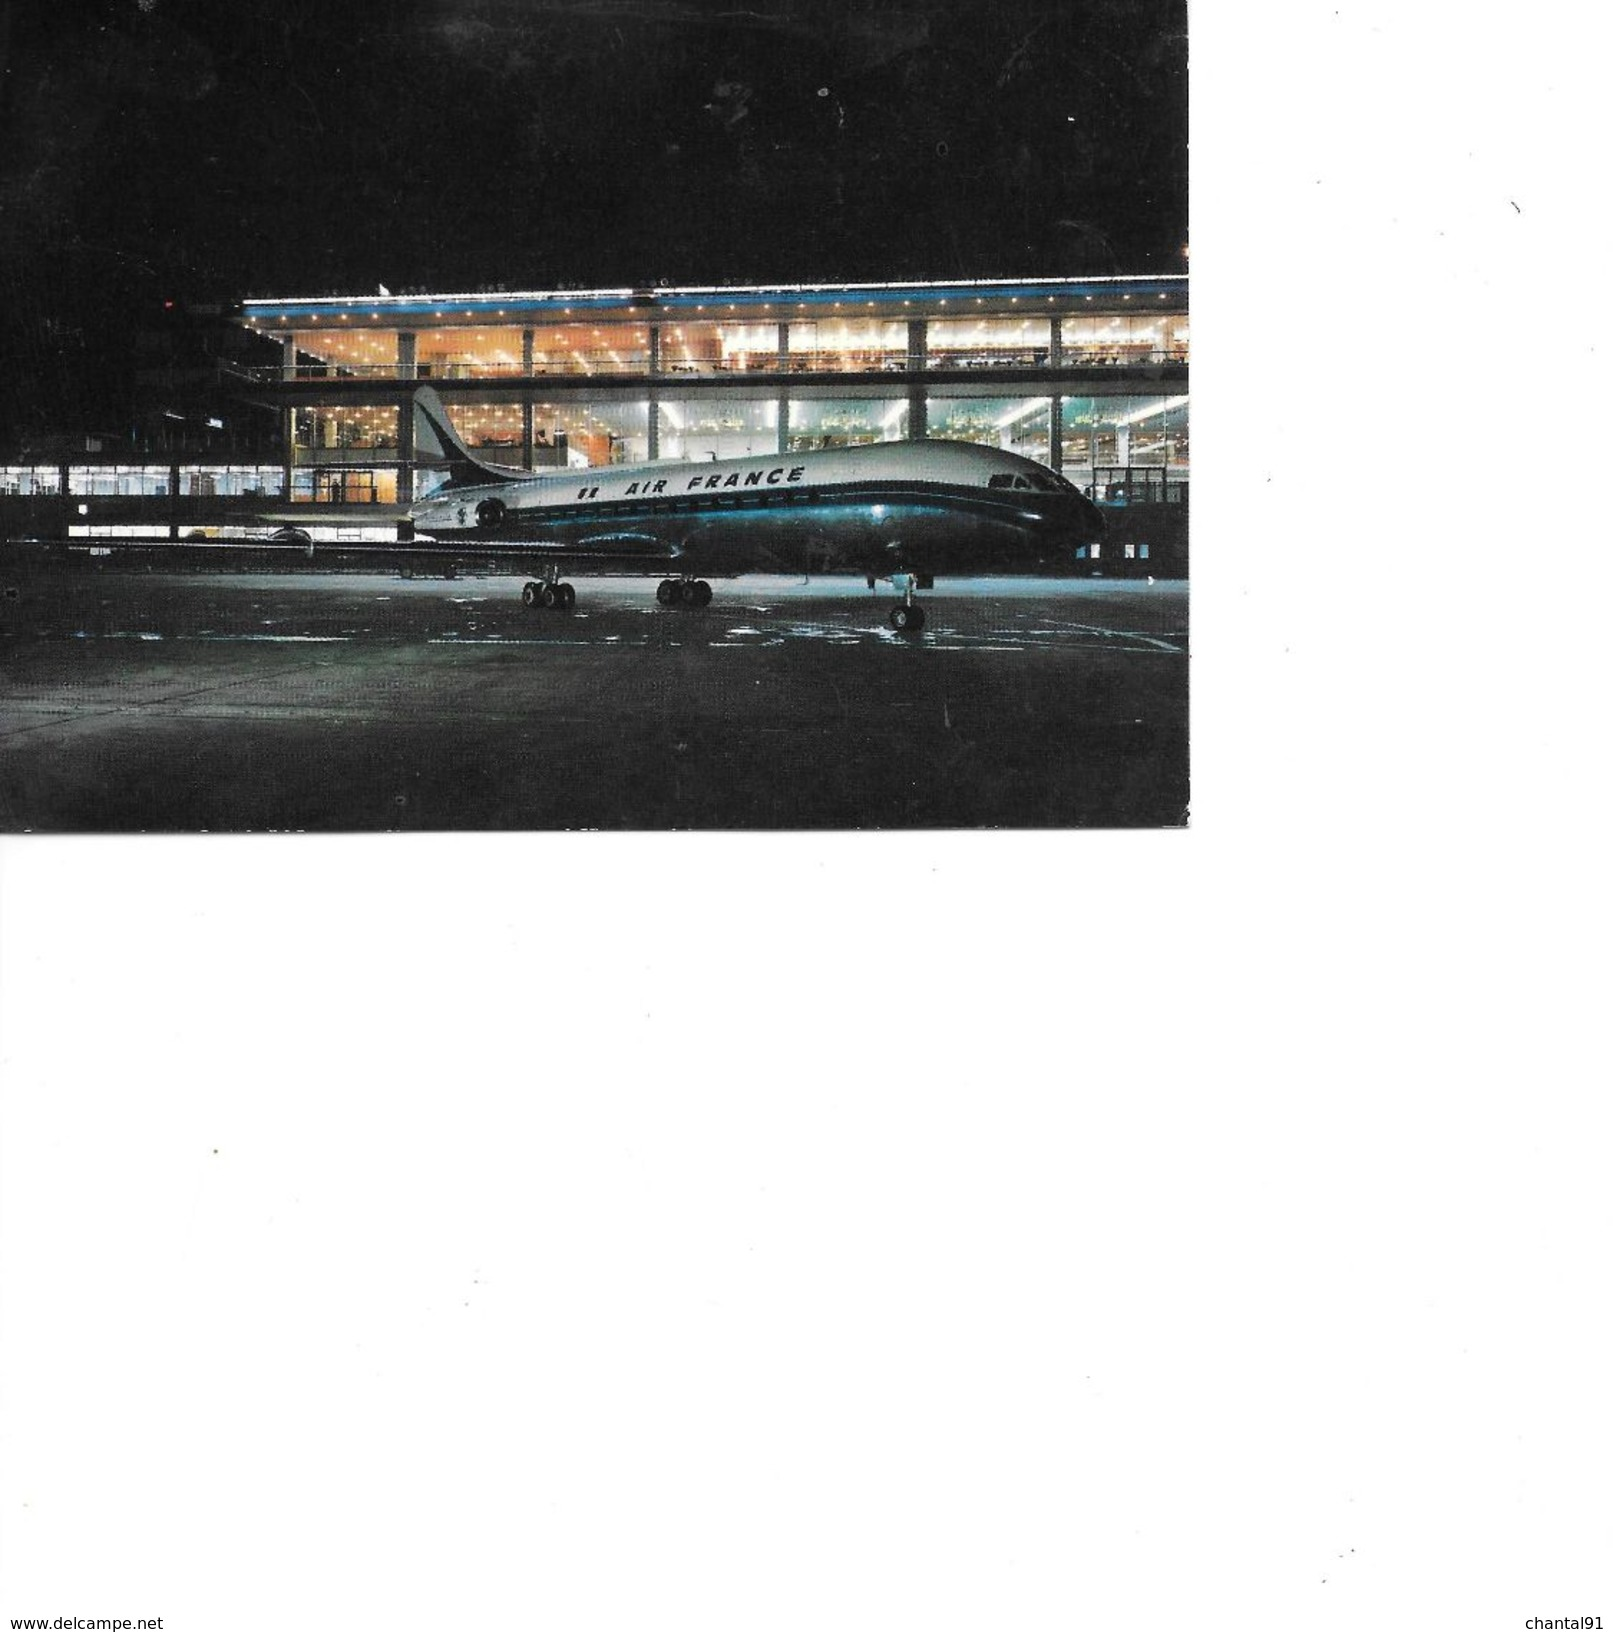 CARTE POSTALE FANTASIE AVION CARAVELLE - Avions